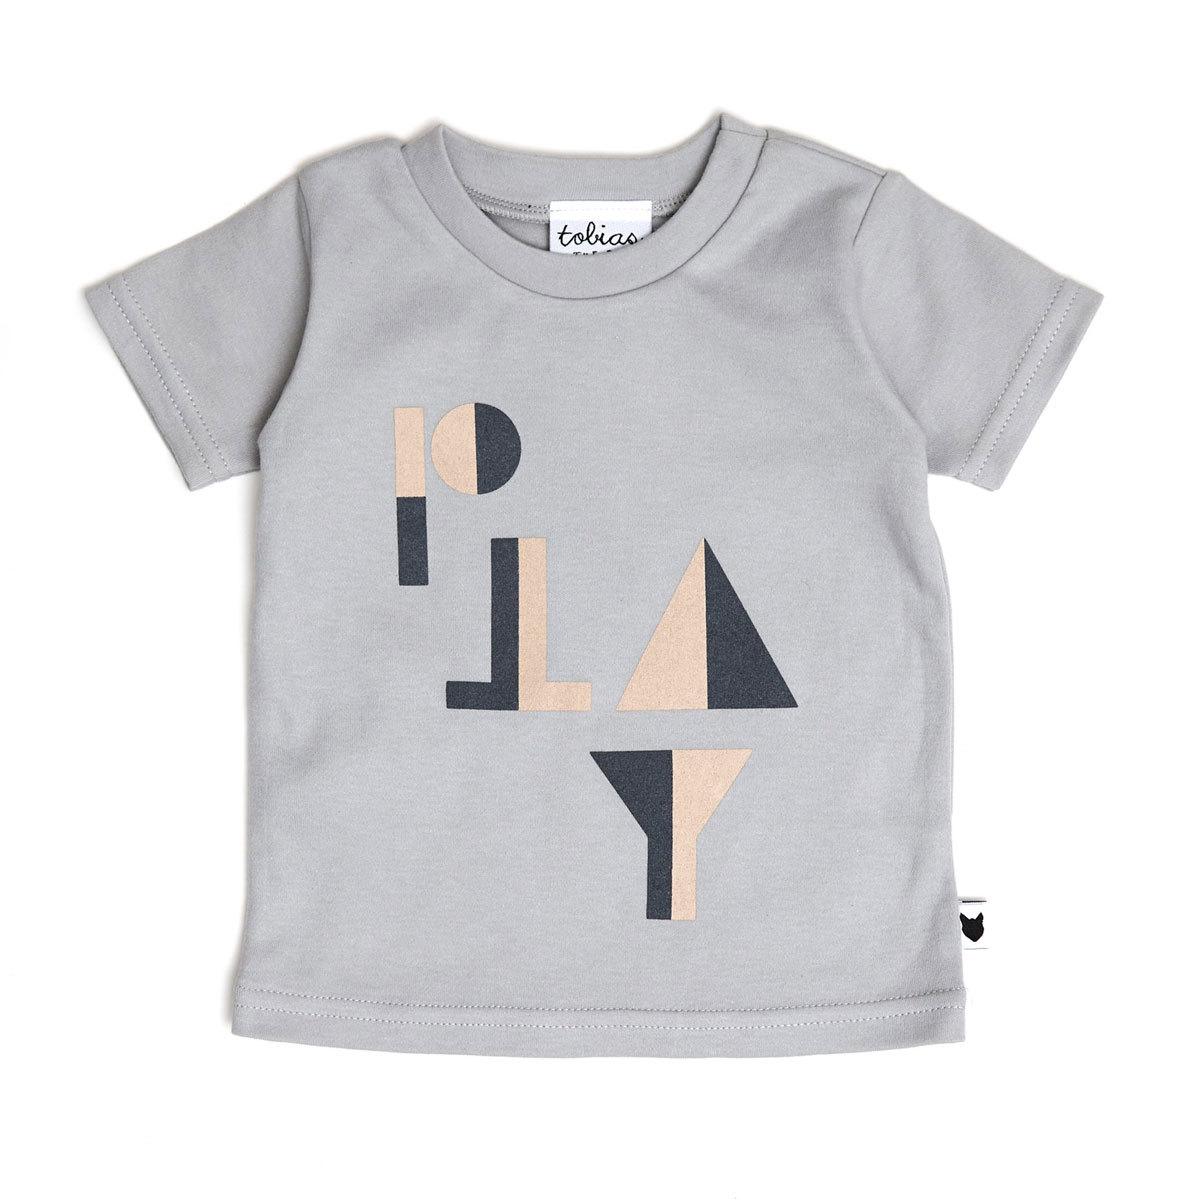 Hauts bébé Tee-Shirt Play - 12/18 Mois Tee-Shirt Play - 12/18 Mois